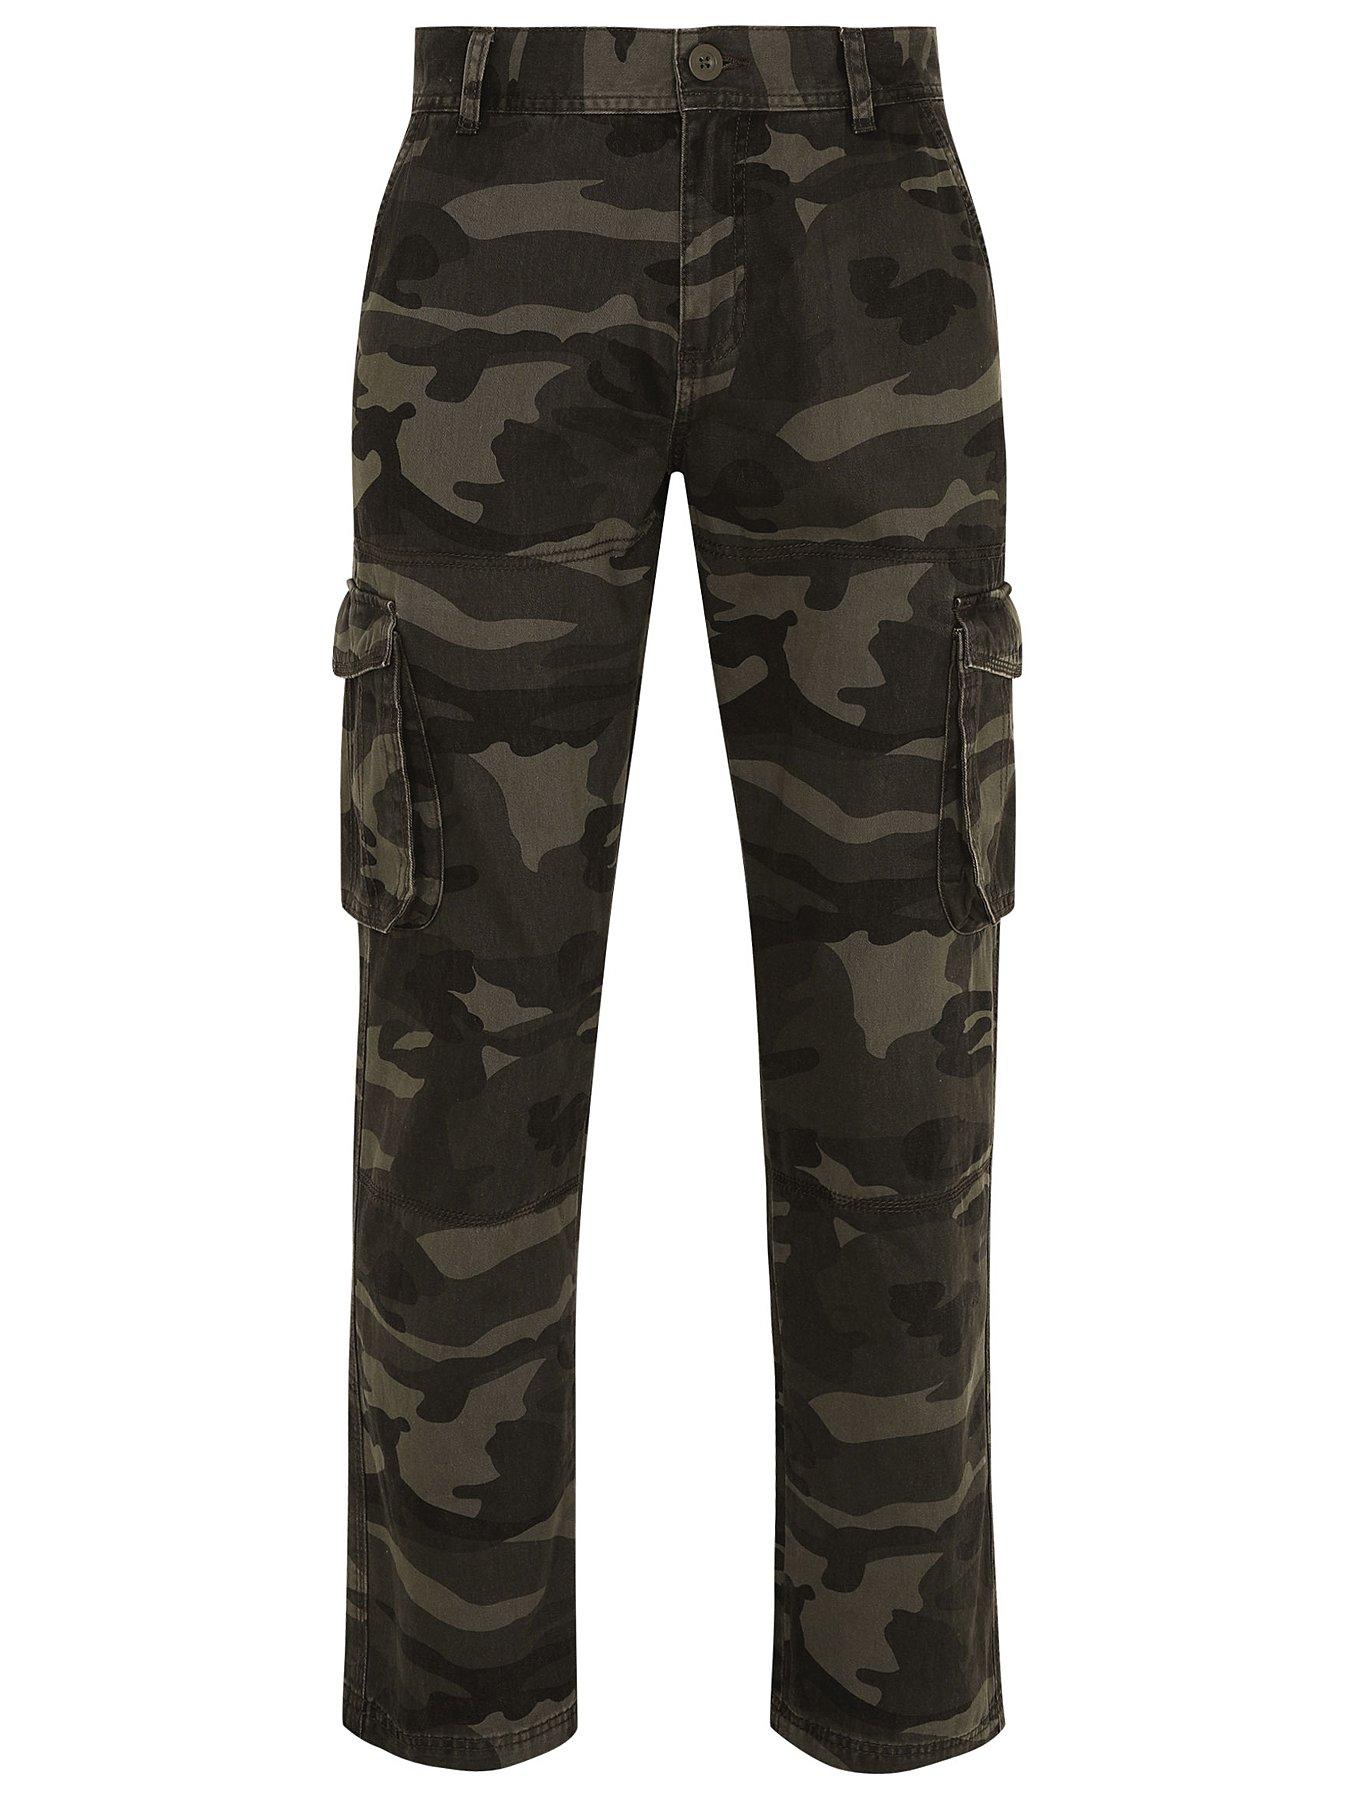 38dde02b5c Khaki Camo Cargo Trousers